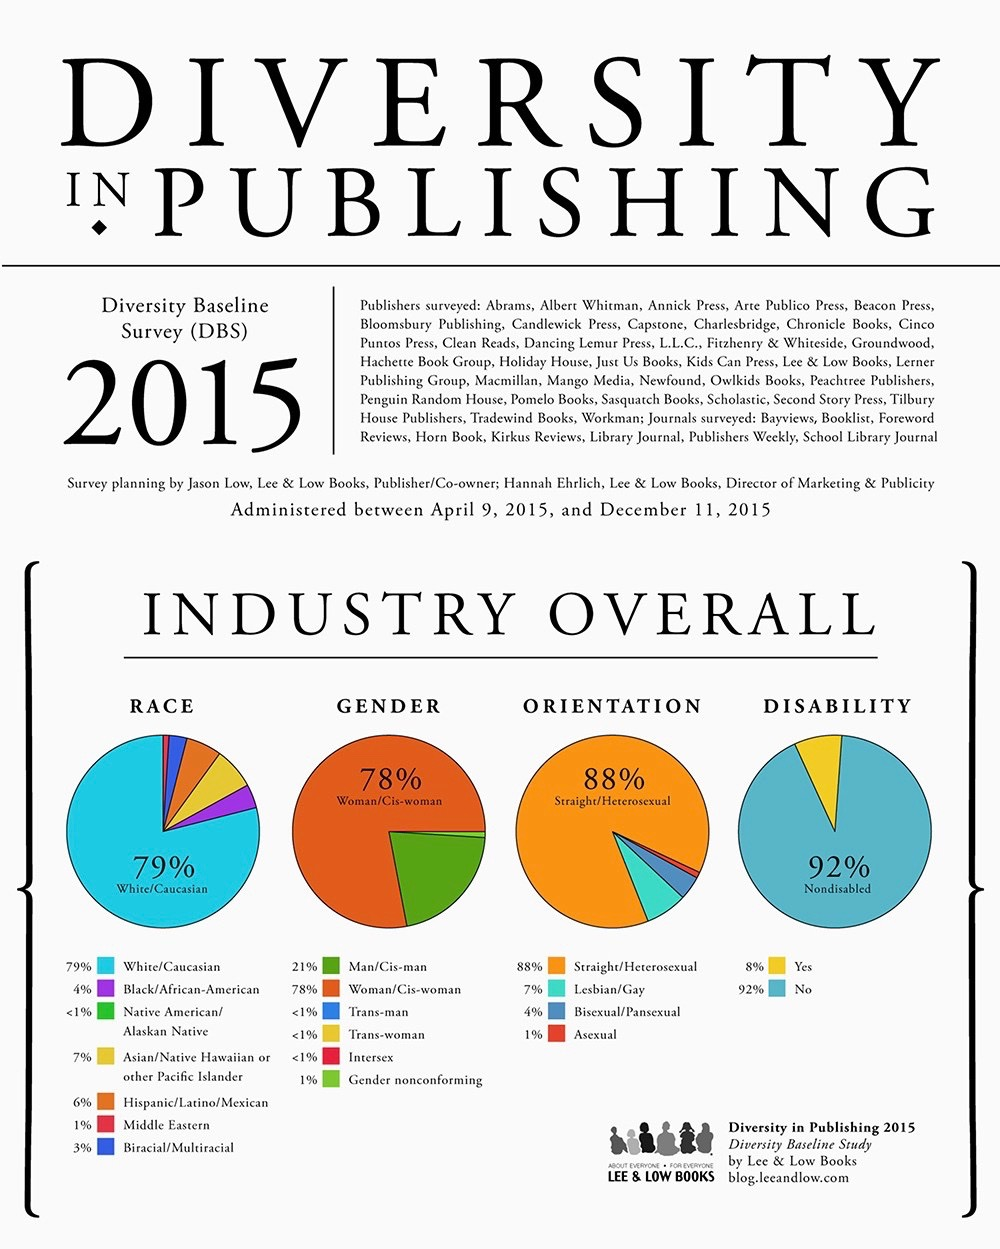 Diversity in Publishing 2015 E - Version 3